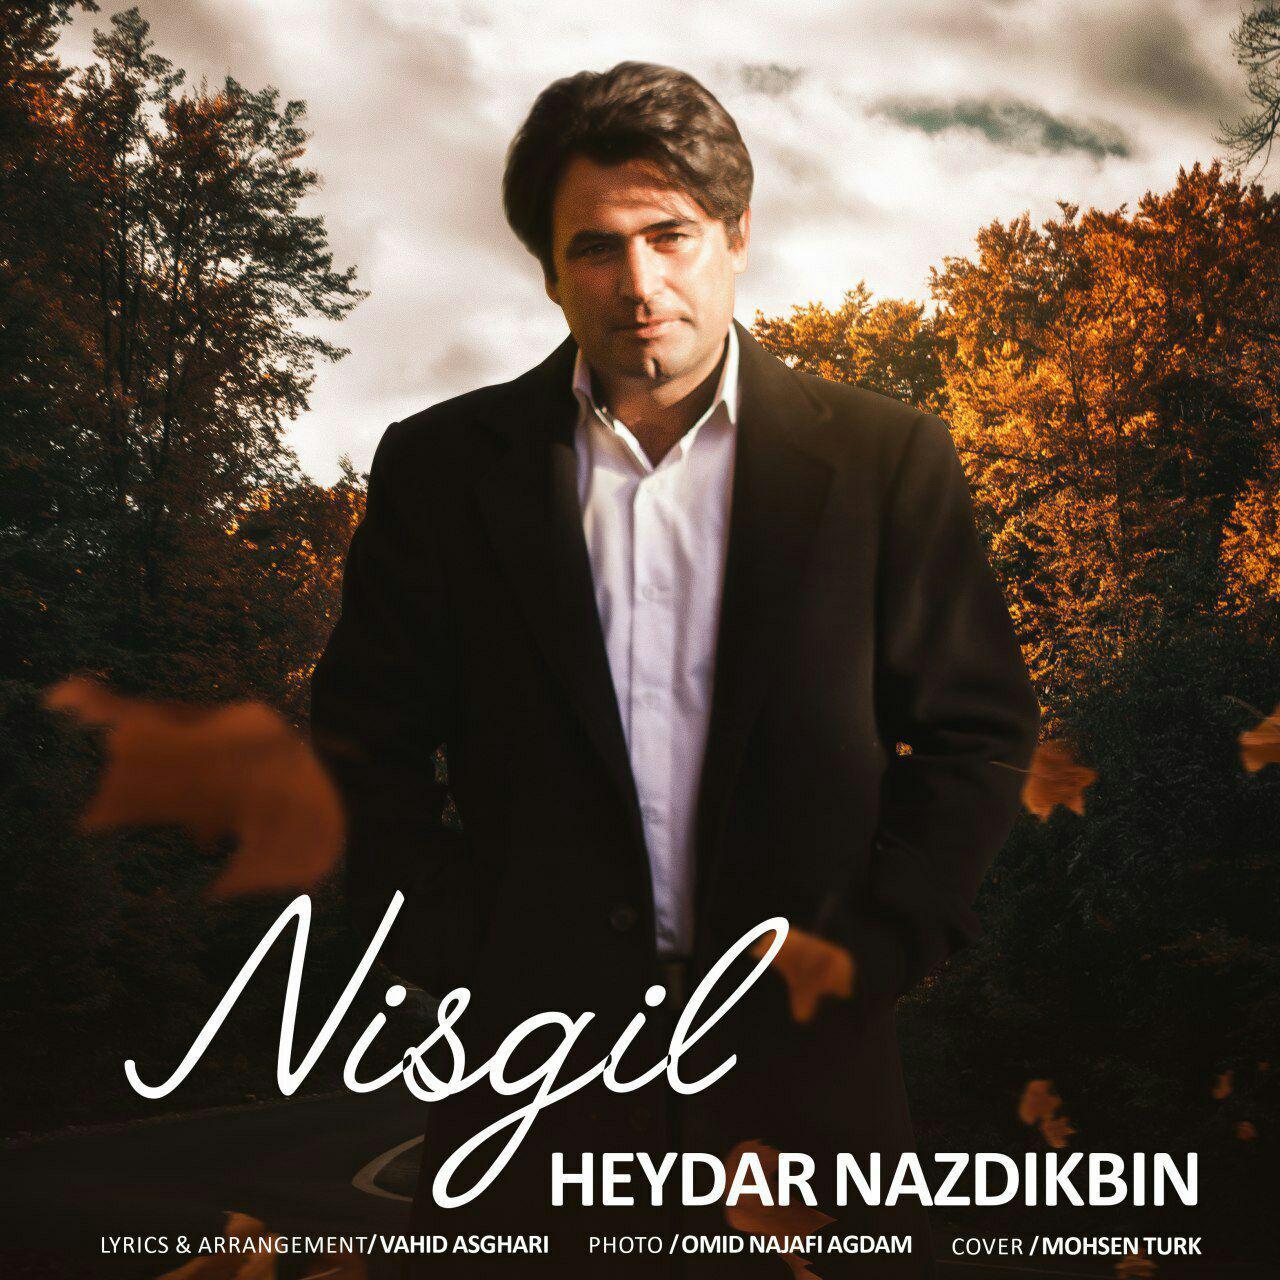 http://birtunes.ir/wp-content/uploads/2018/11/Heydar-Nazdikbin-Nisgil.jpg